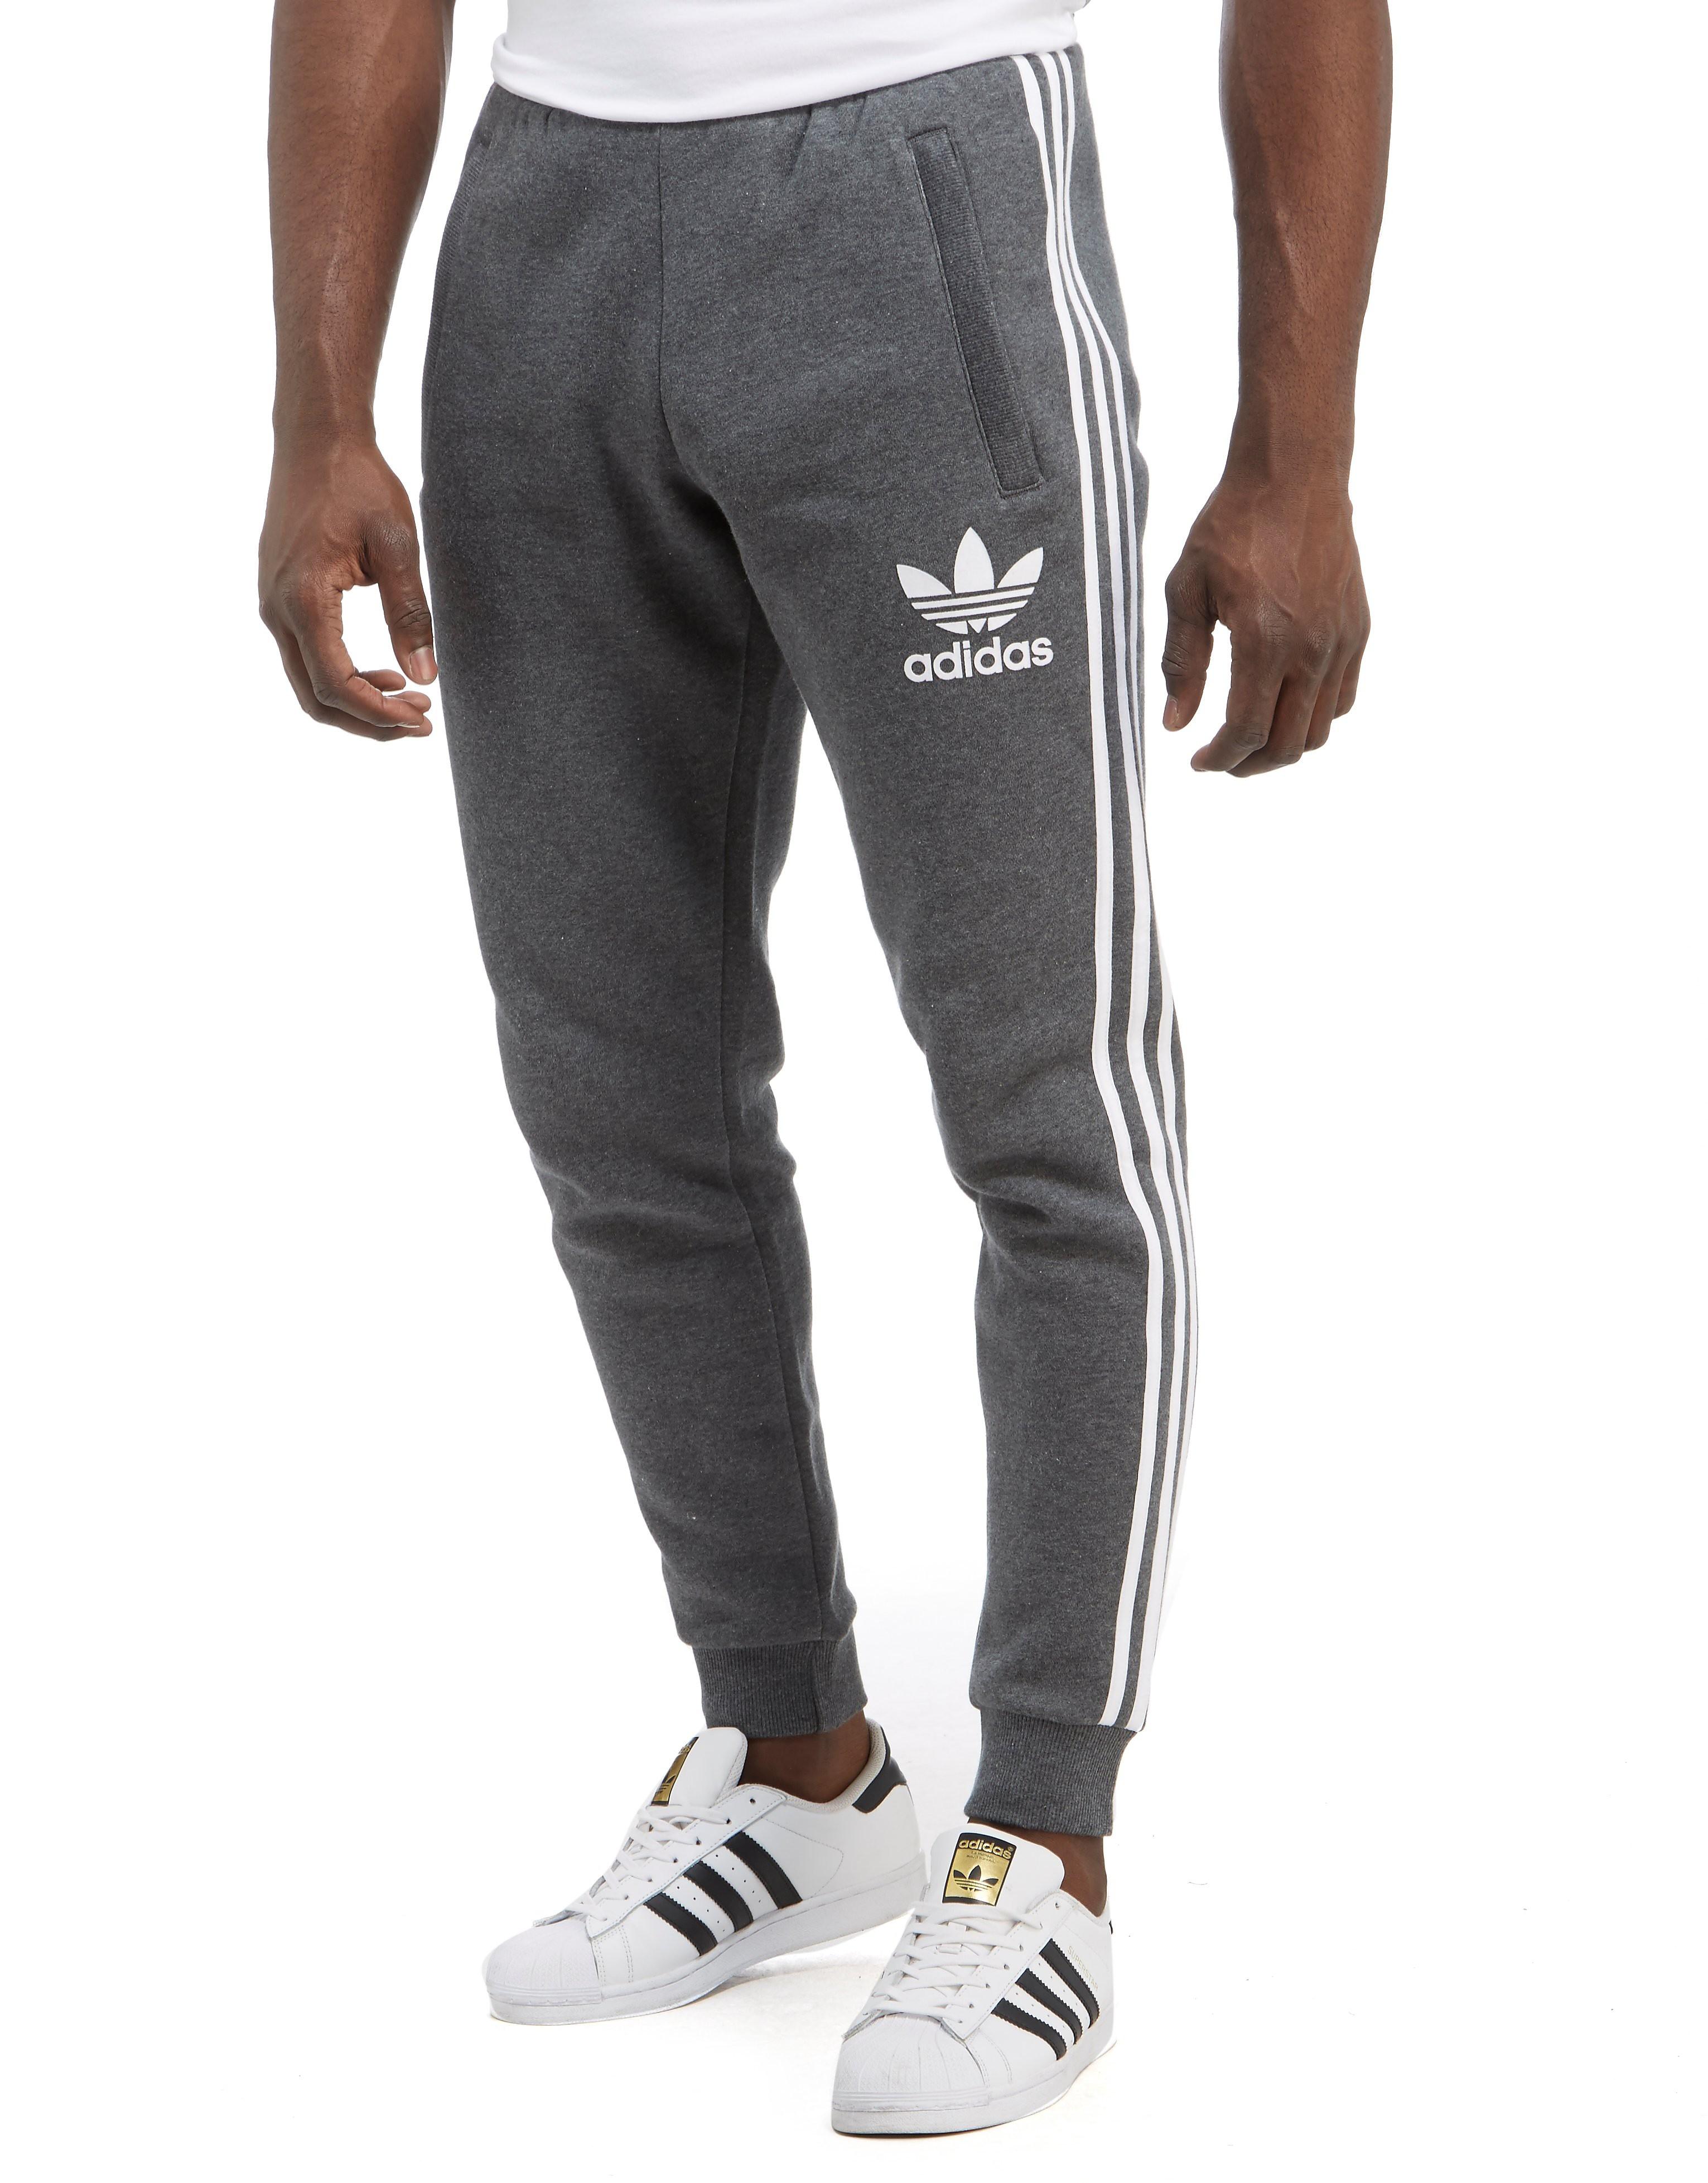 adidas Originals California Pants